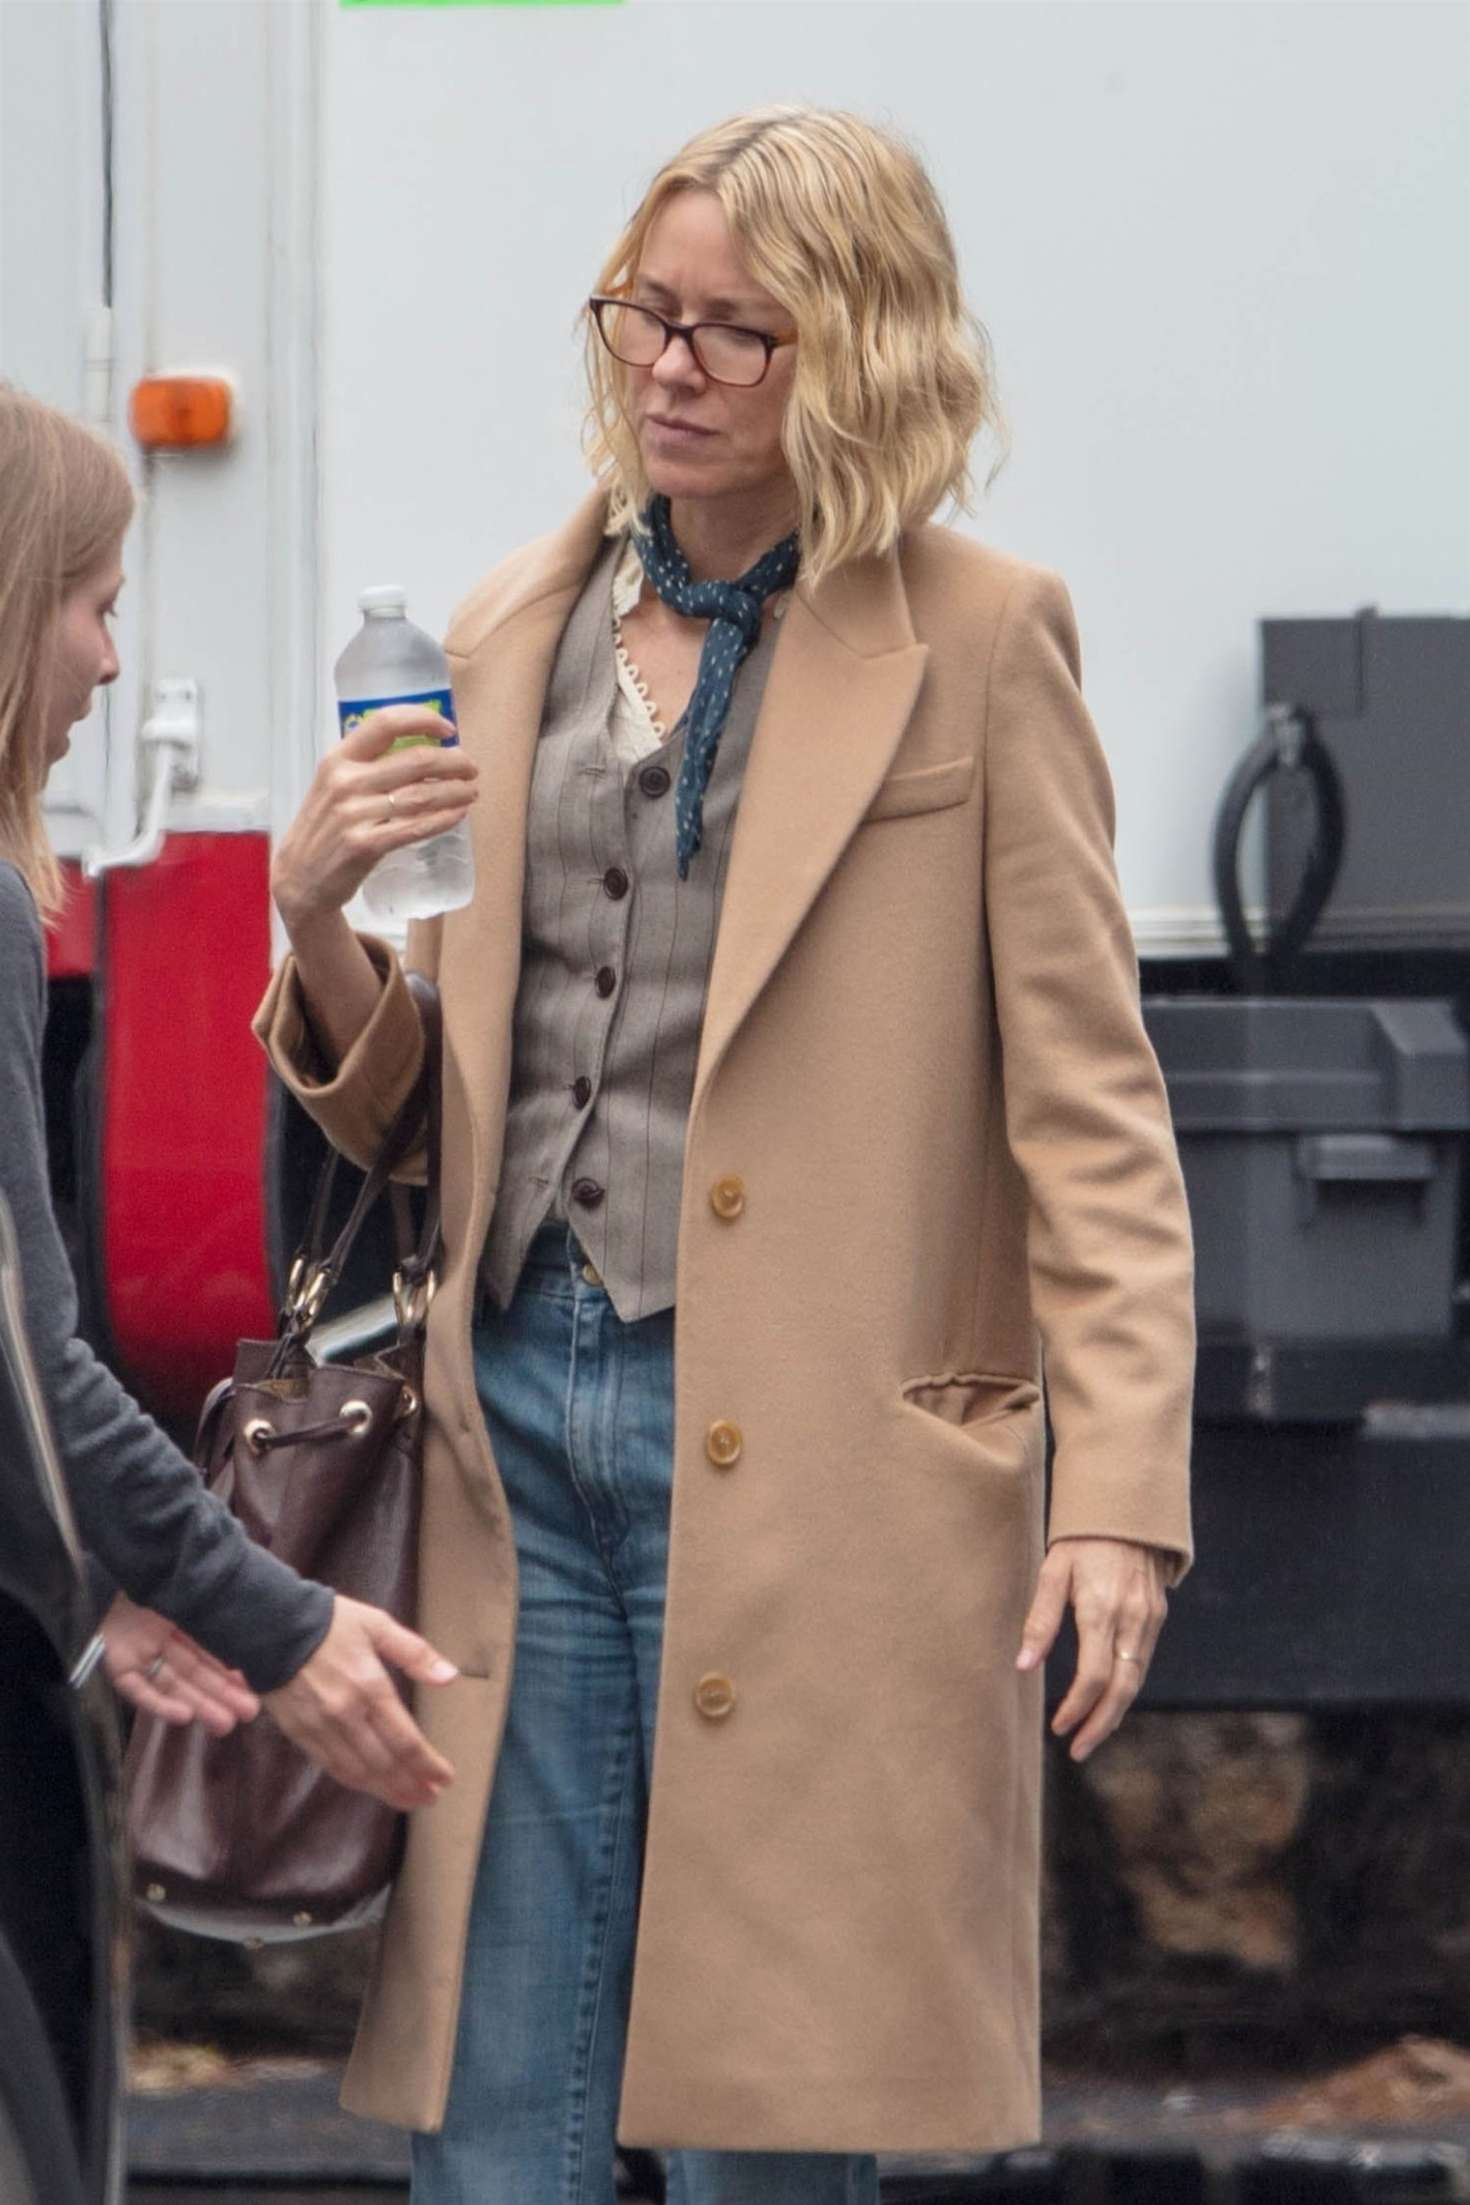 Naomi Watts - On the set of 'Boss Level' in Atlanta